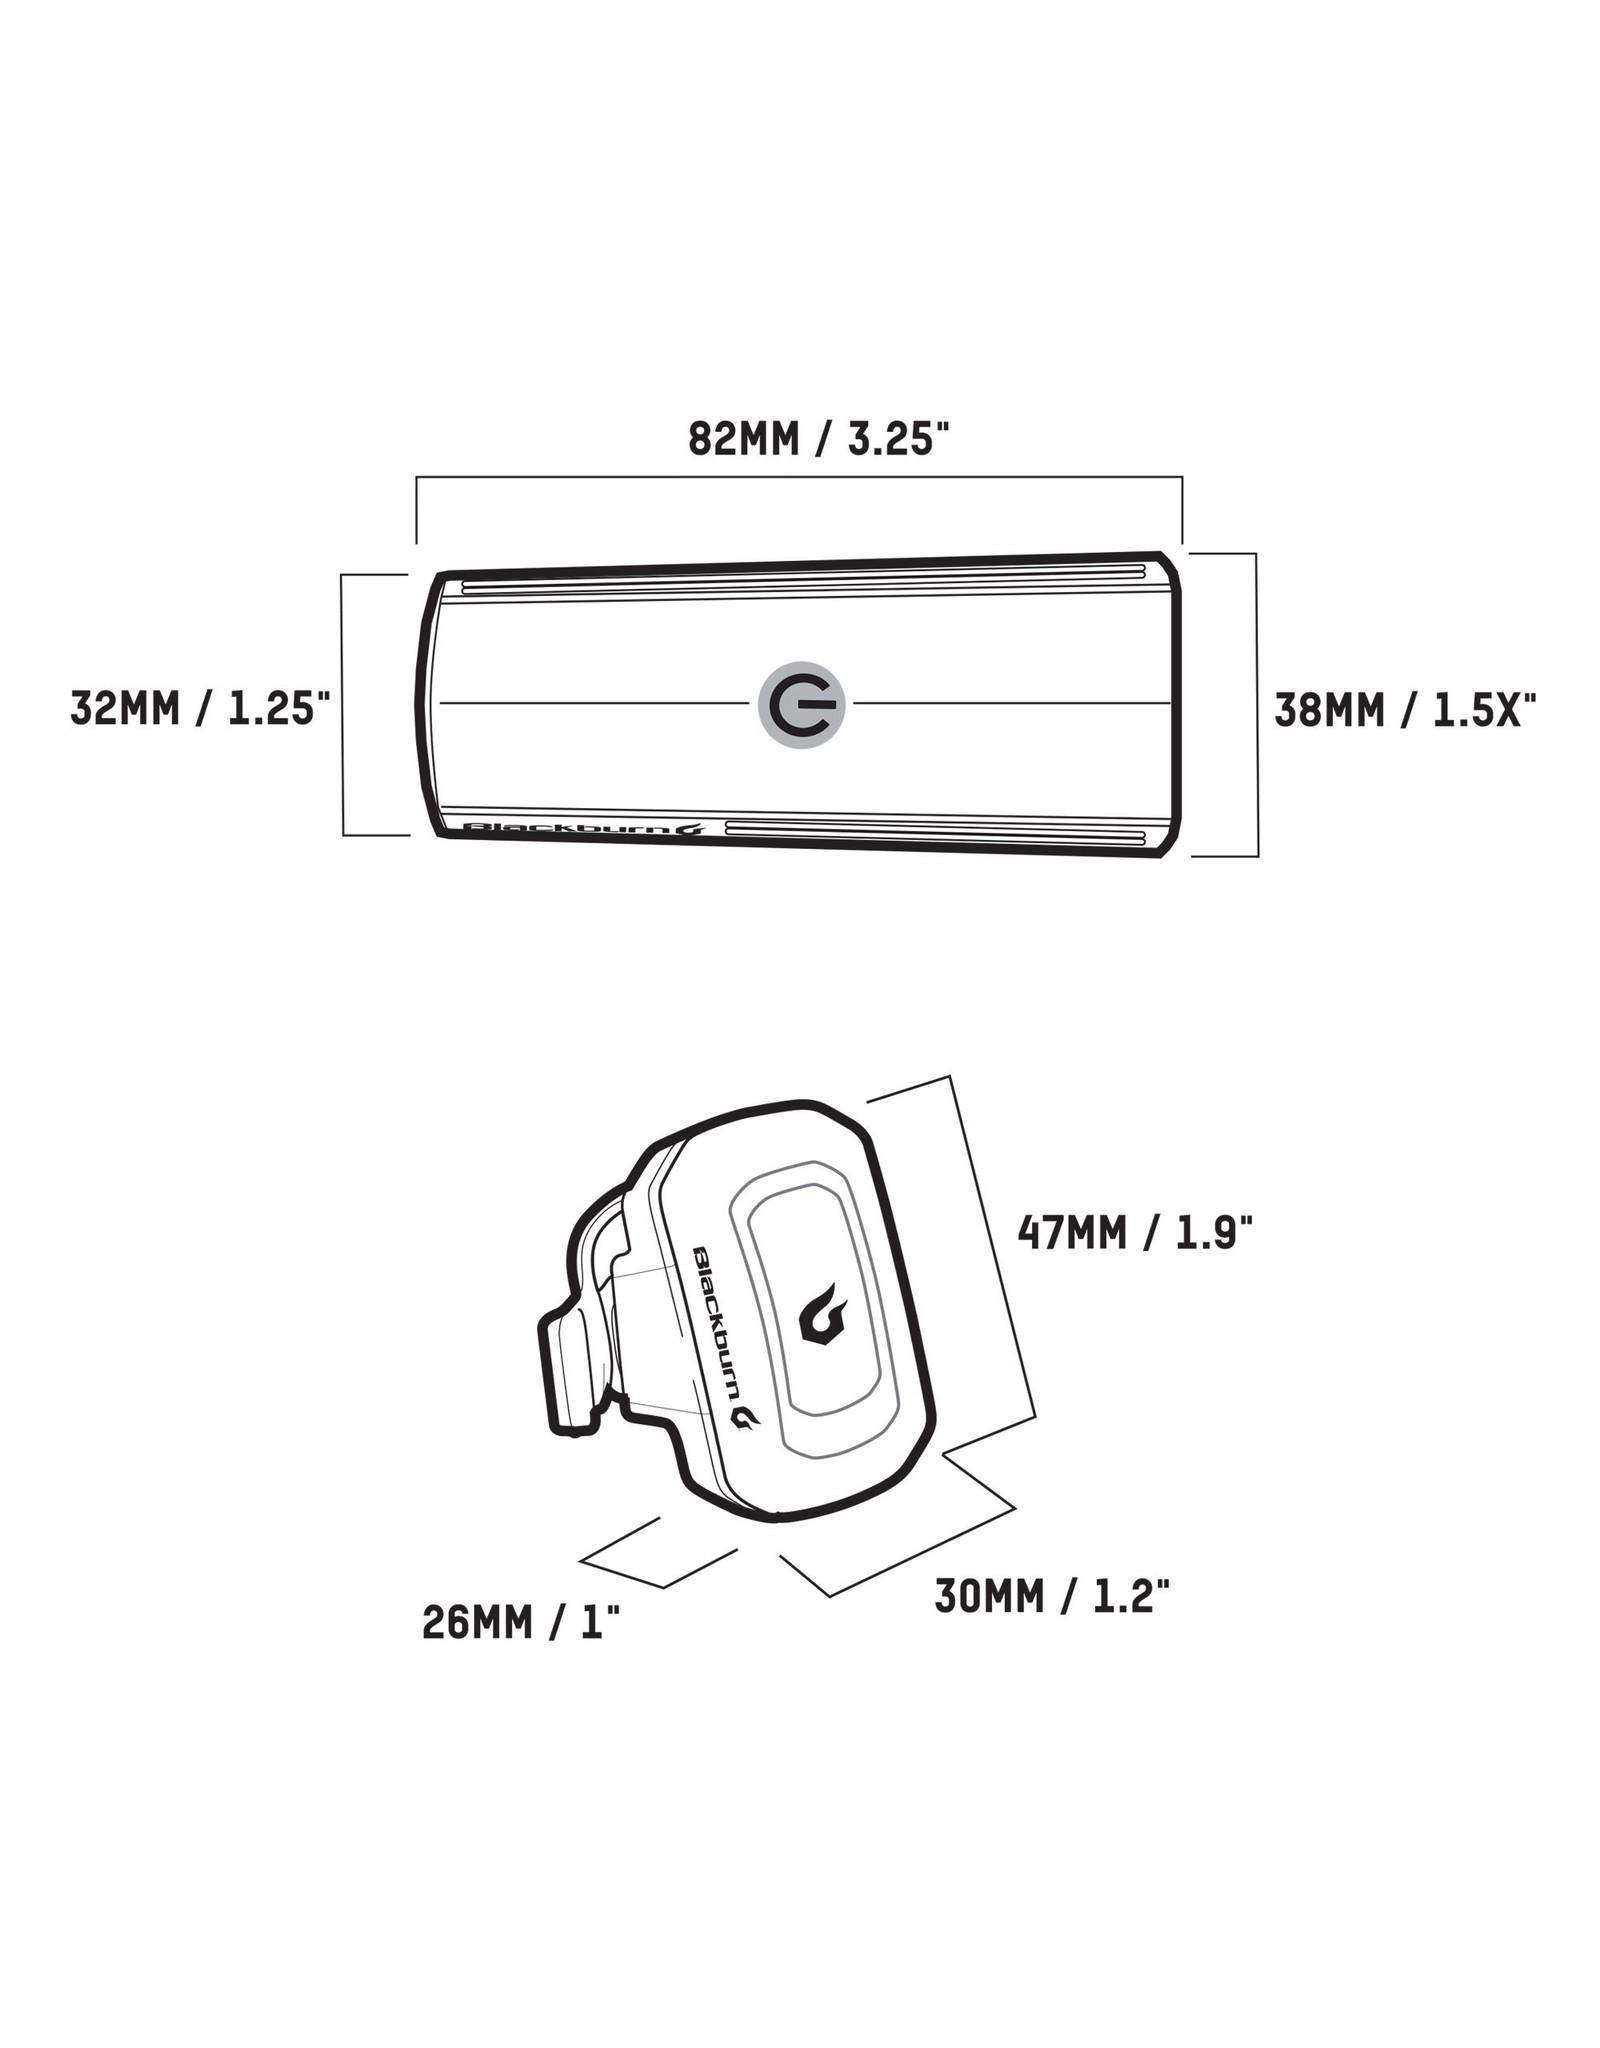 Blackburn BKB DAYBLAZER 400 FRONT and CLICK USB REAR